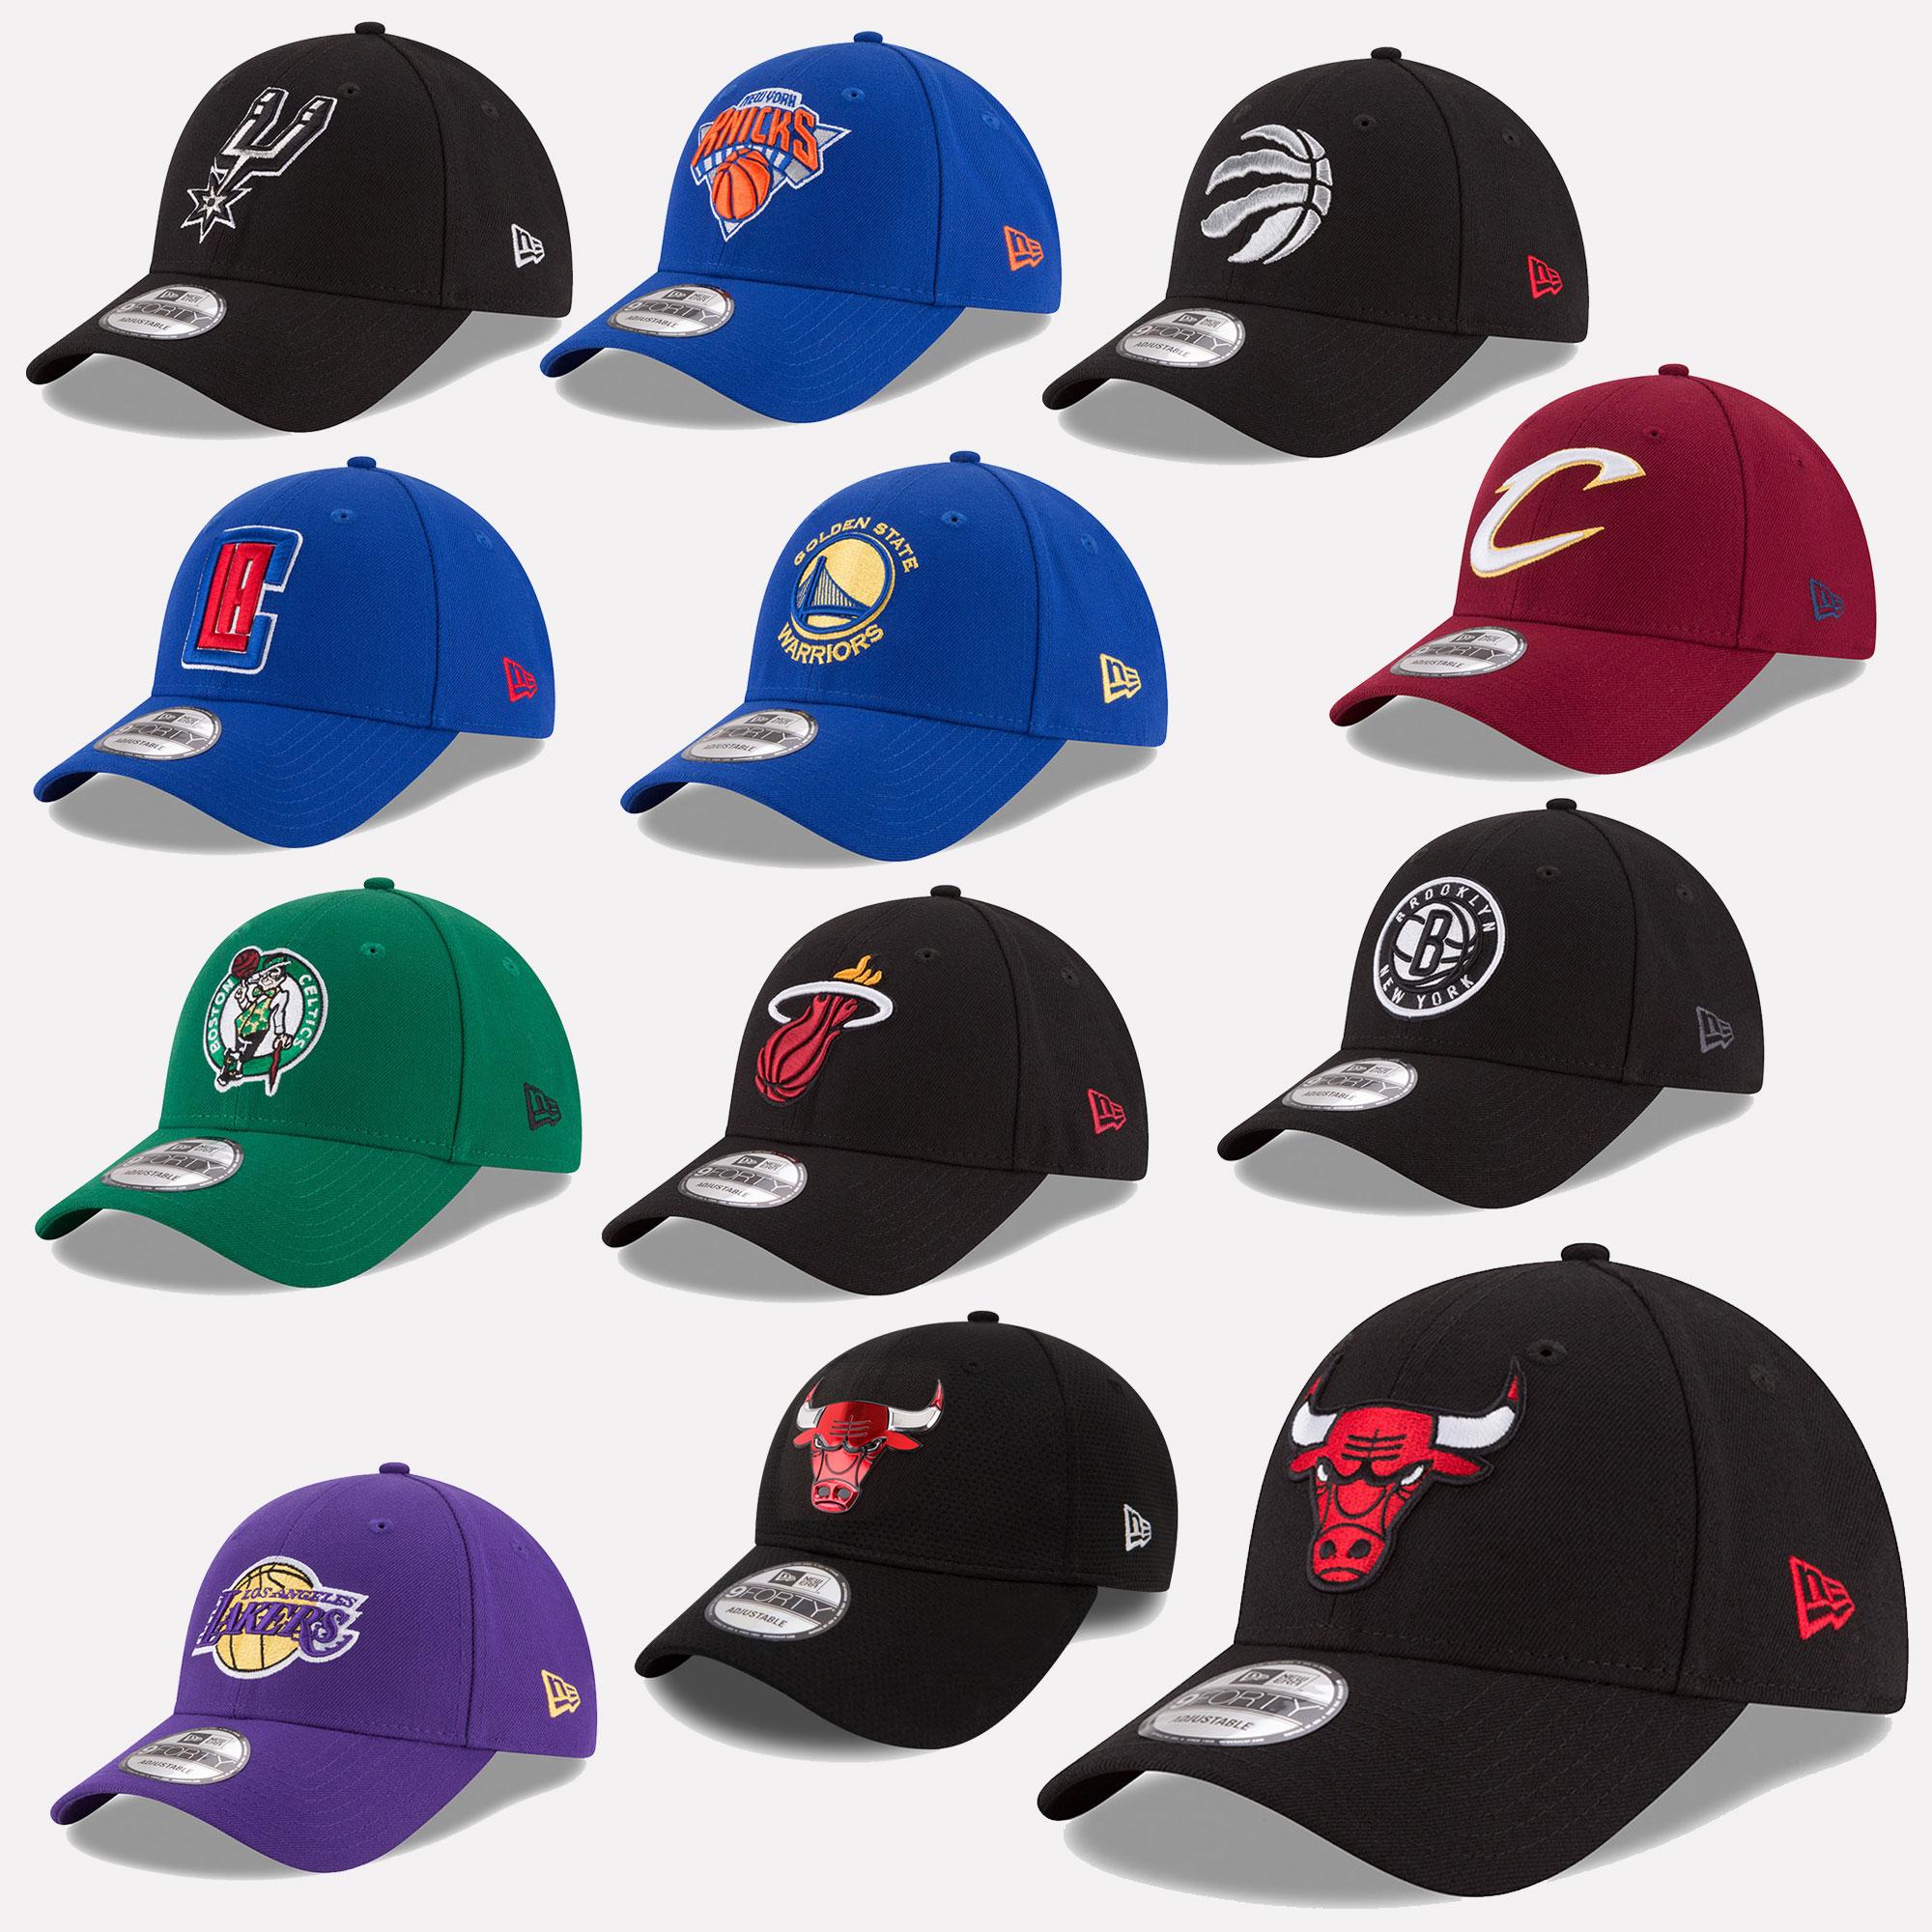 New Era Cappello 9forty NBA 2017 The League Chicago Bulls Brooklyn ... f3131fa0ee9